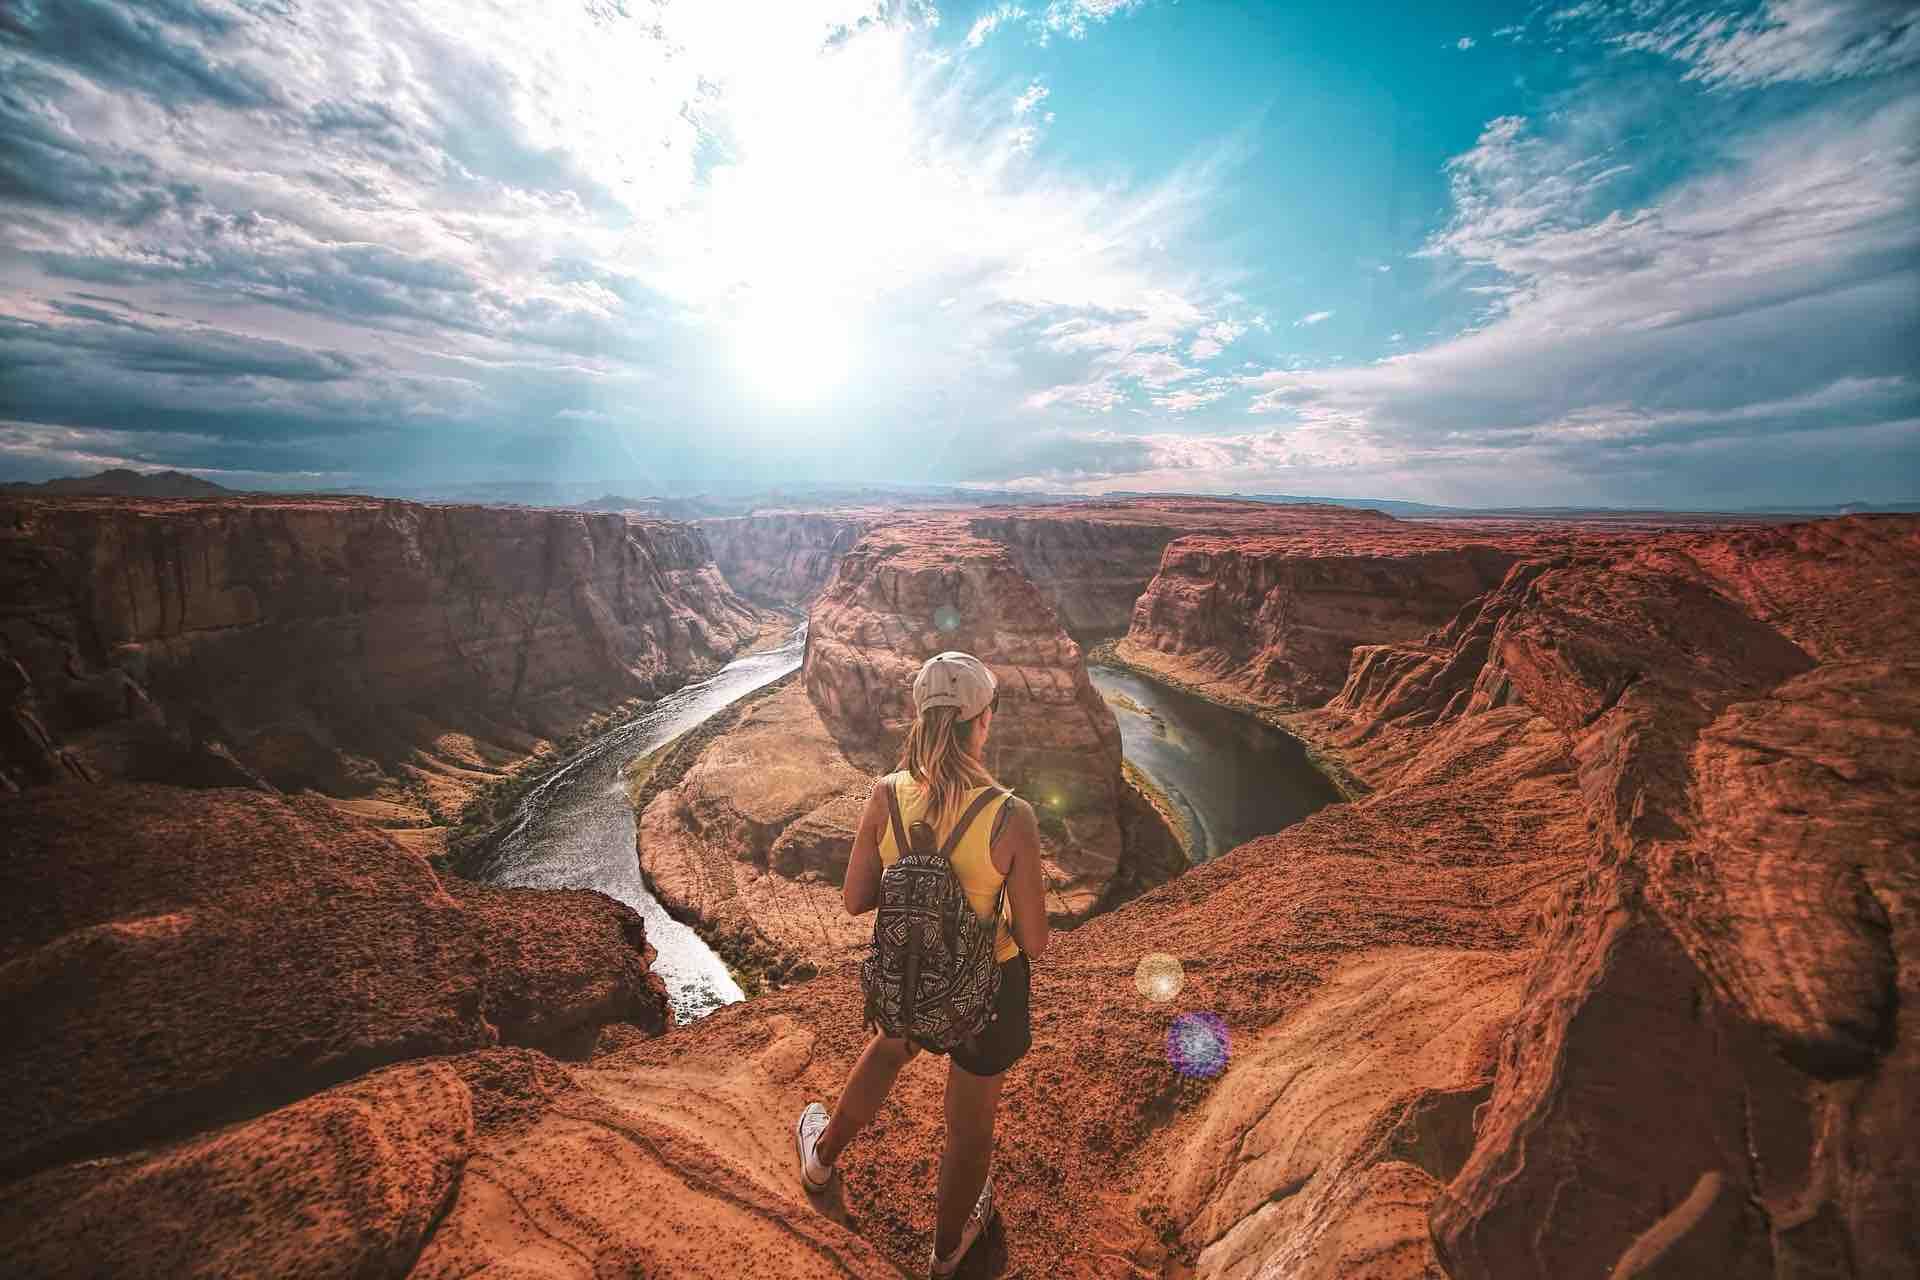 voyage exploration femme vue paysage